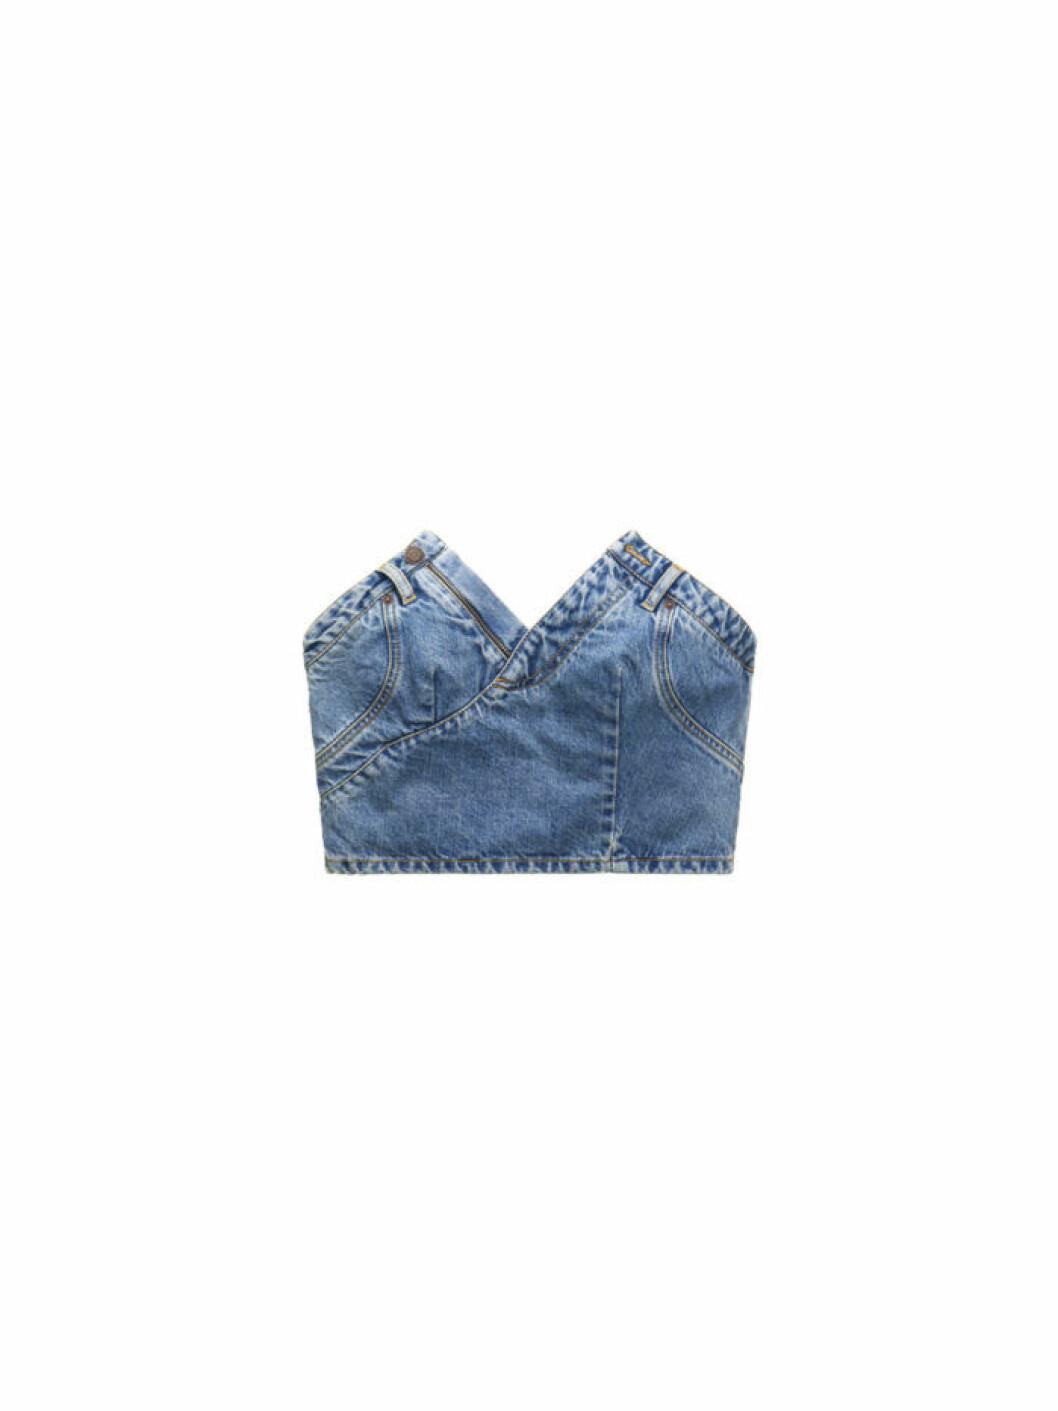 Axelbandslös croptop från Moschino [tv] H&M